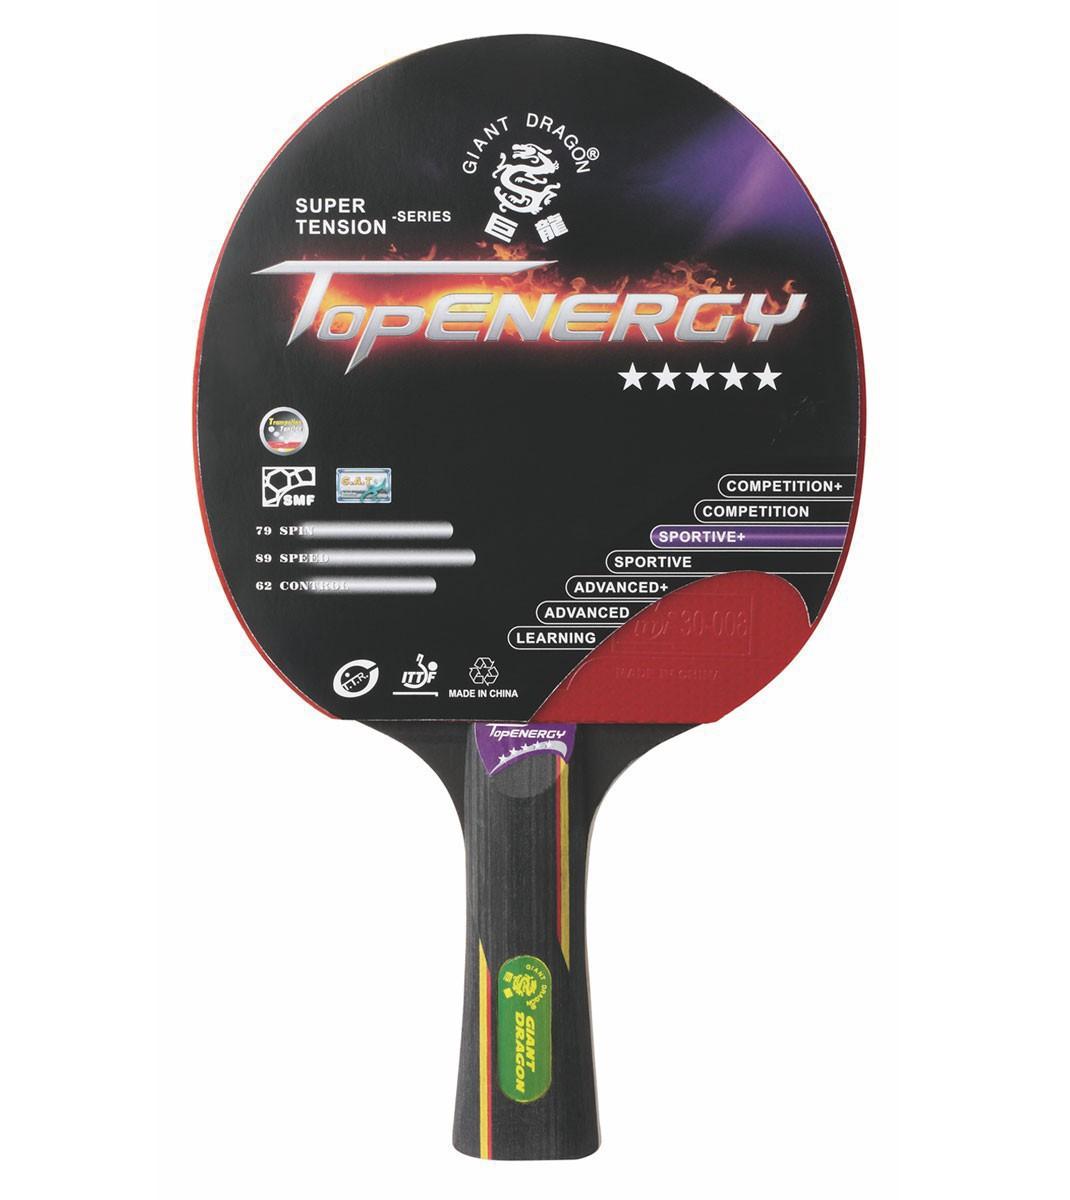 Ракетка для настольного тенниса Giant Dragon ST12501 TopEnergy, красная